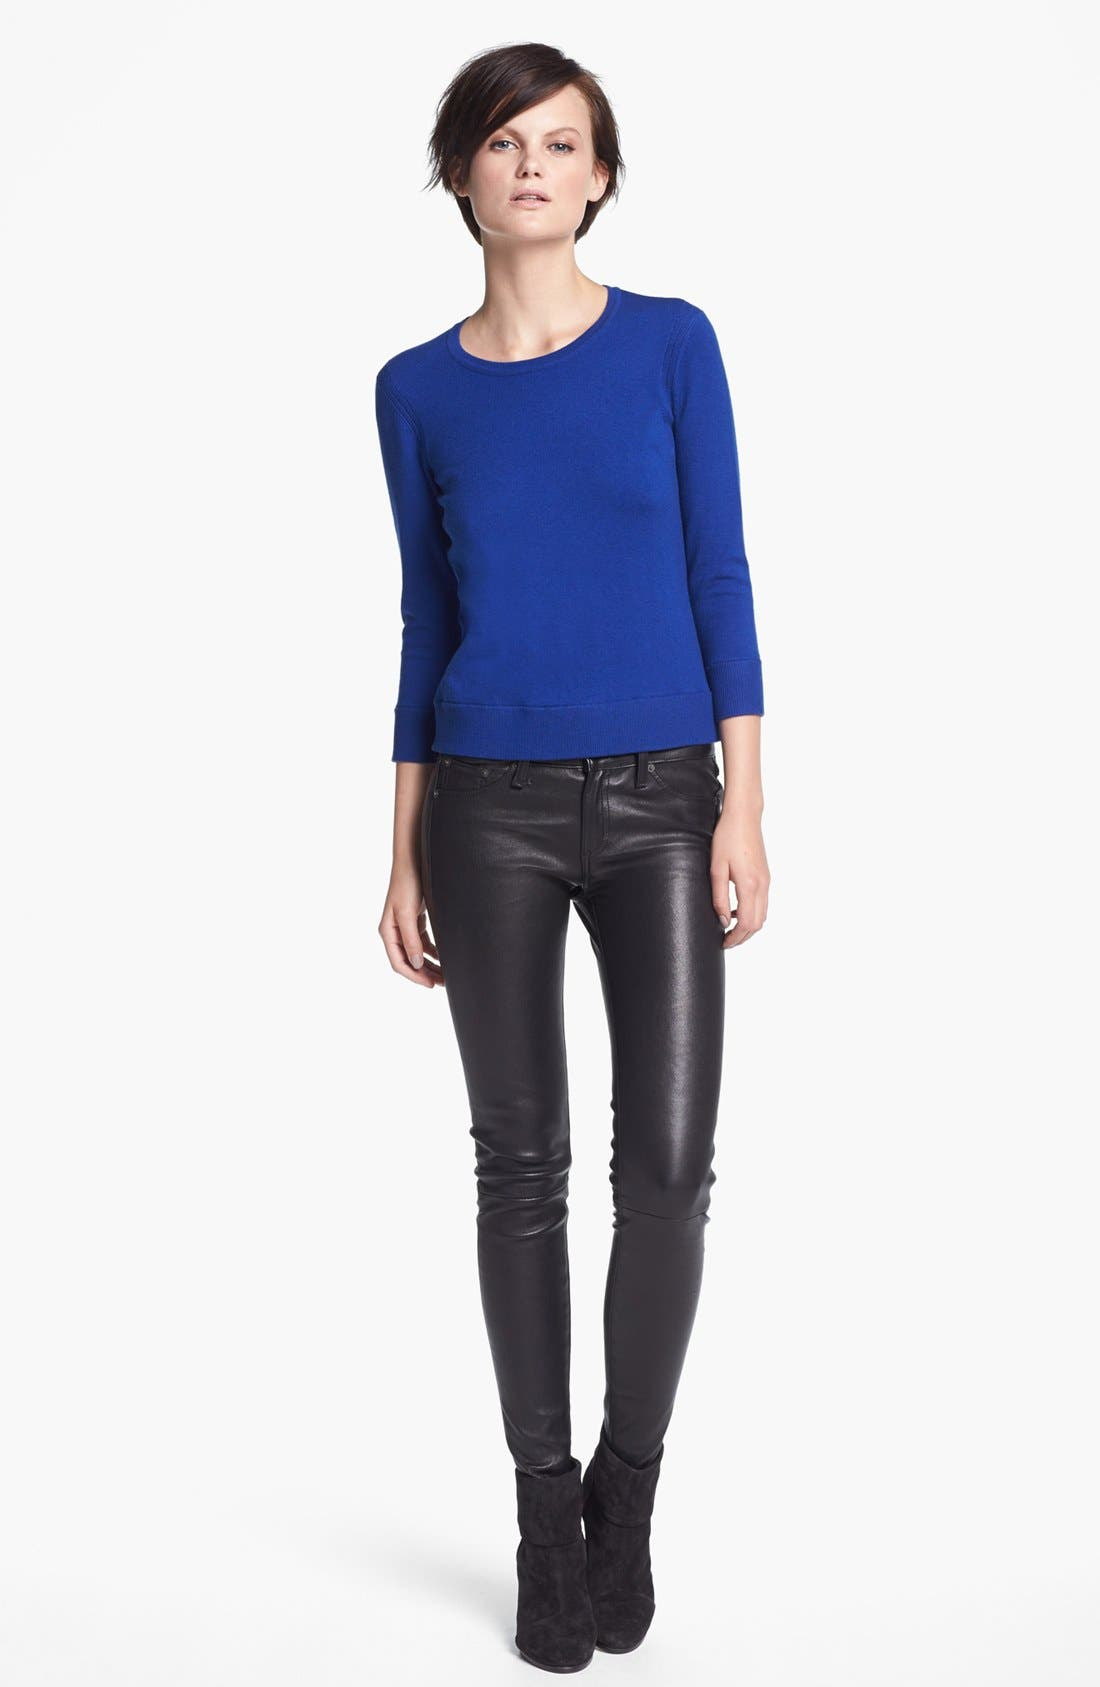 Alternate Image 1 Selected - rag & bone/JEAN 'Natalie' Crewneck Sweater